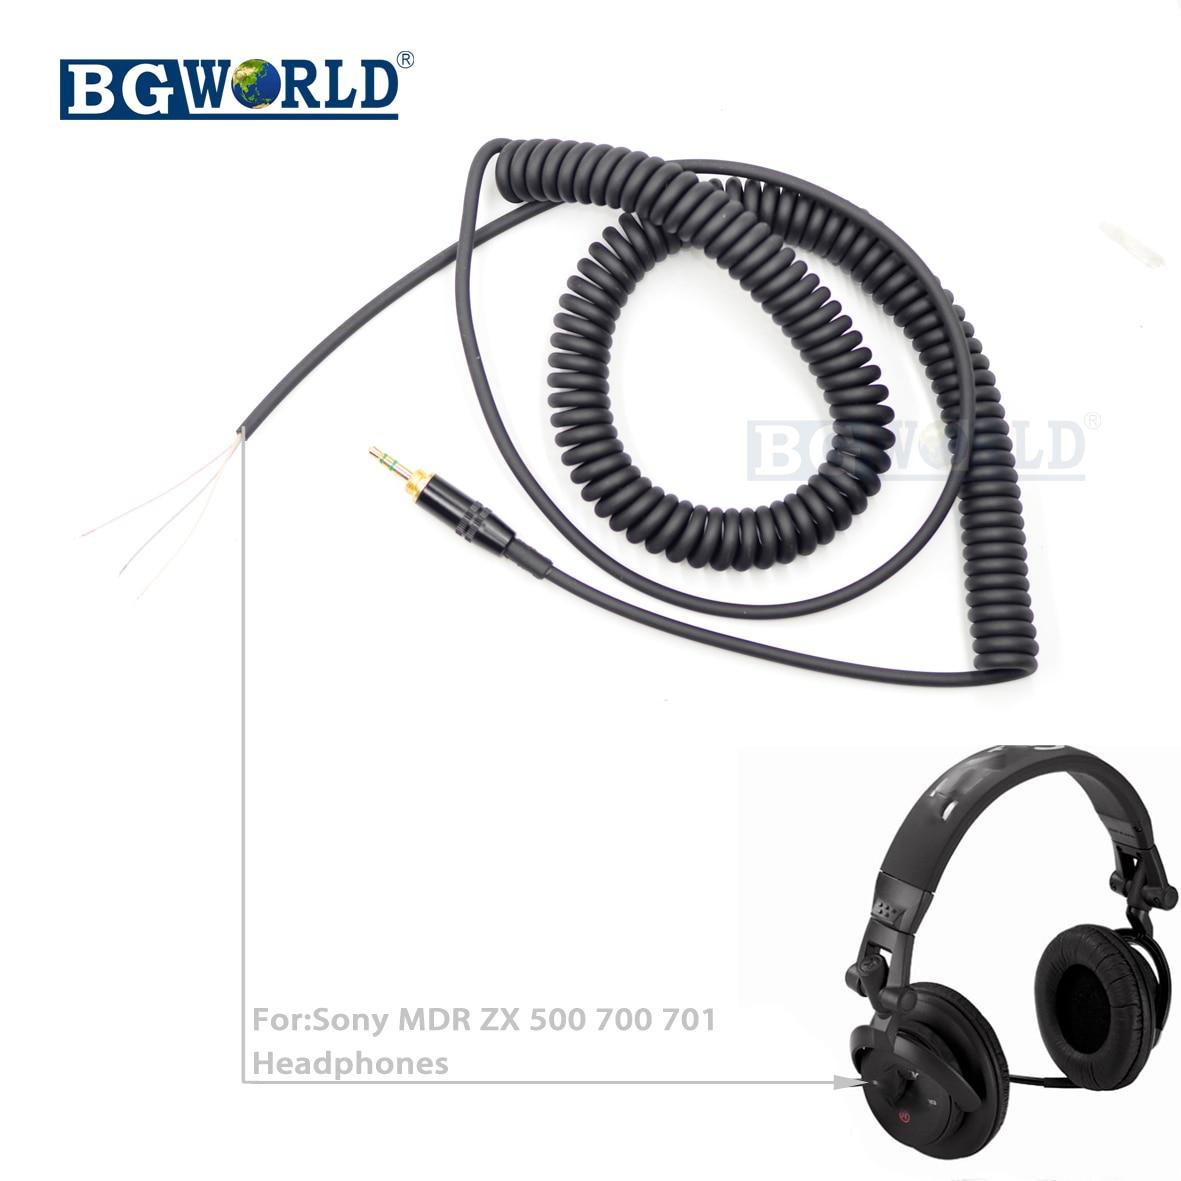 bgworld replacement dj headphone cable cord line plug